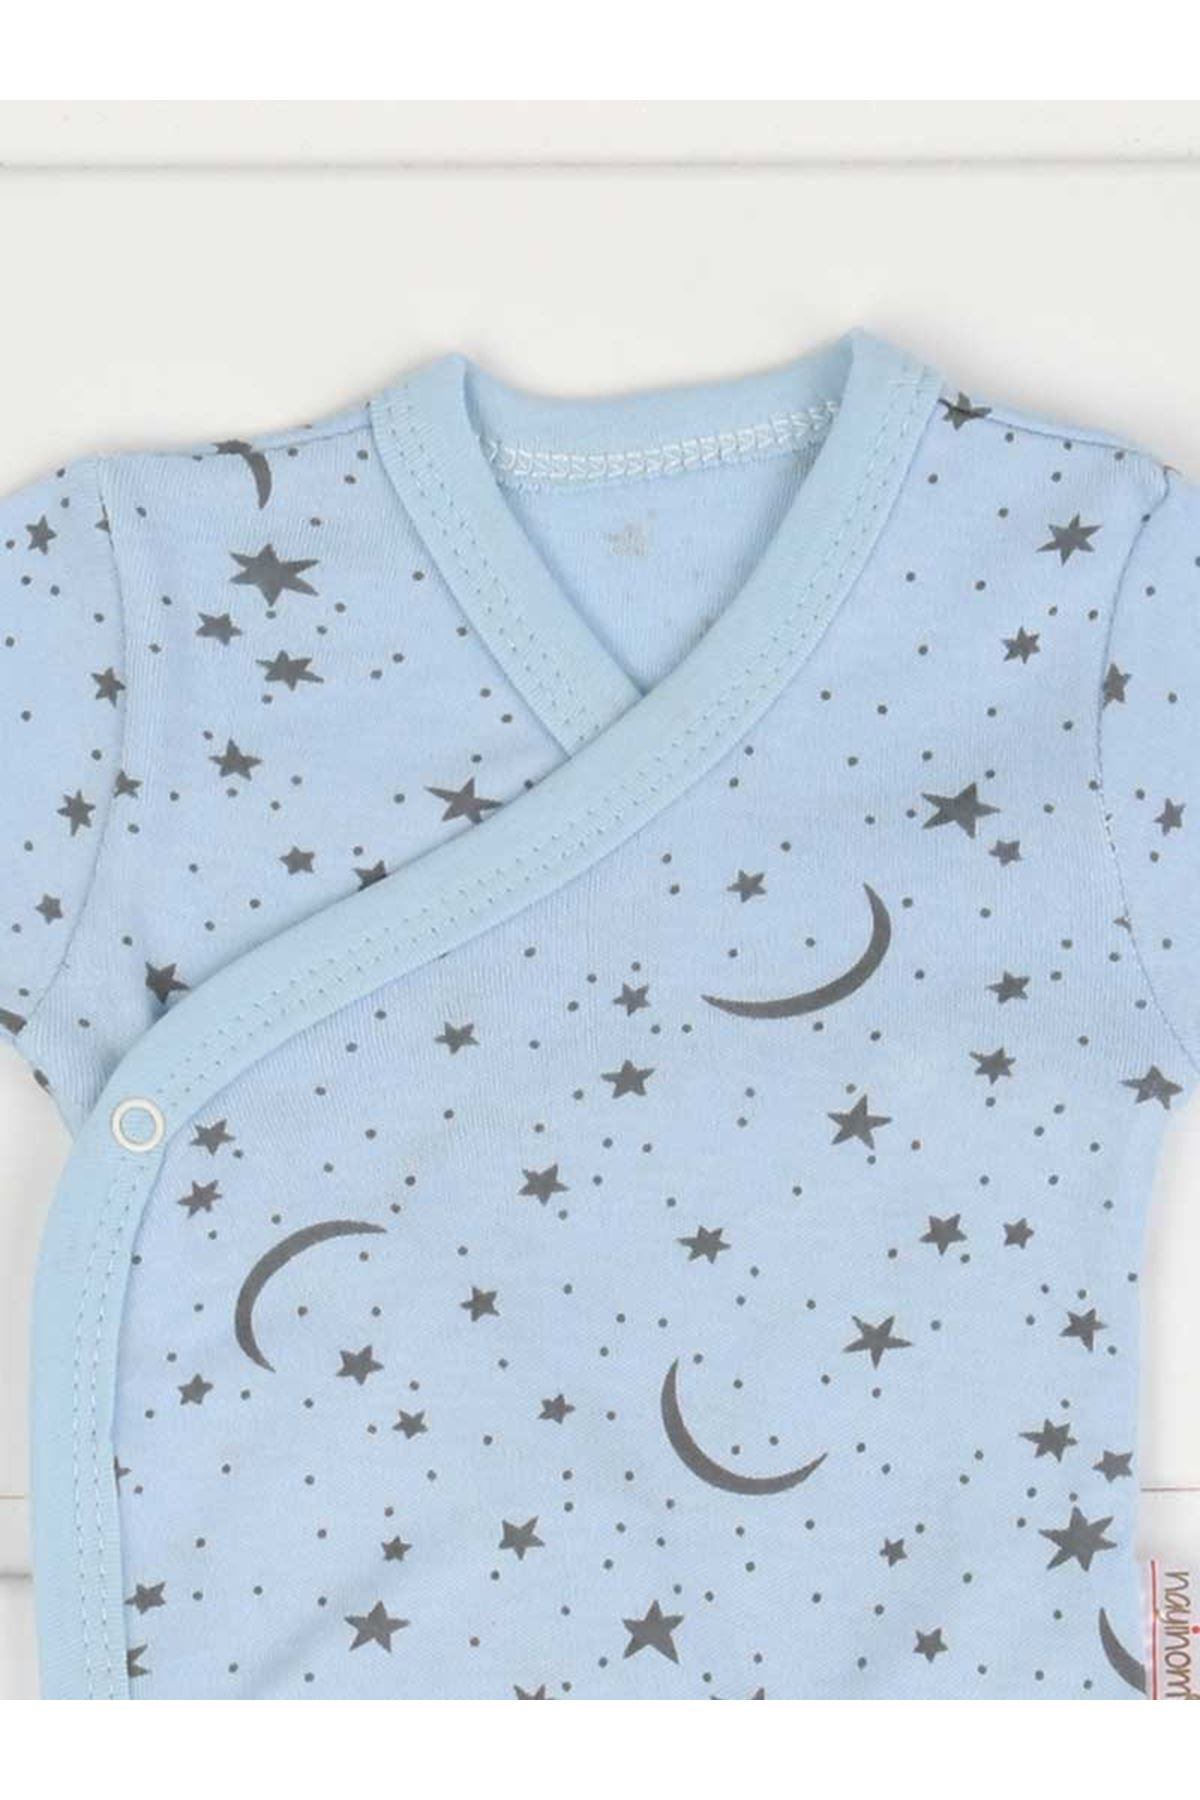 Blue Newborn Long Sleeve Baby Boy Badi